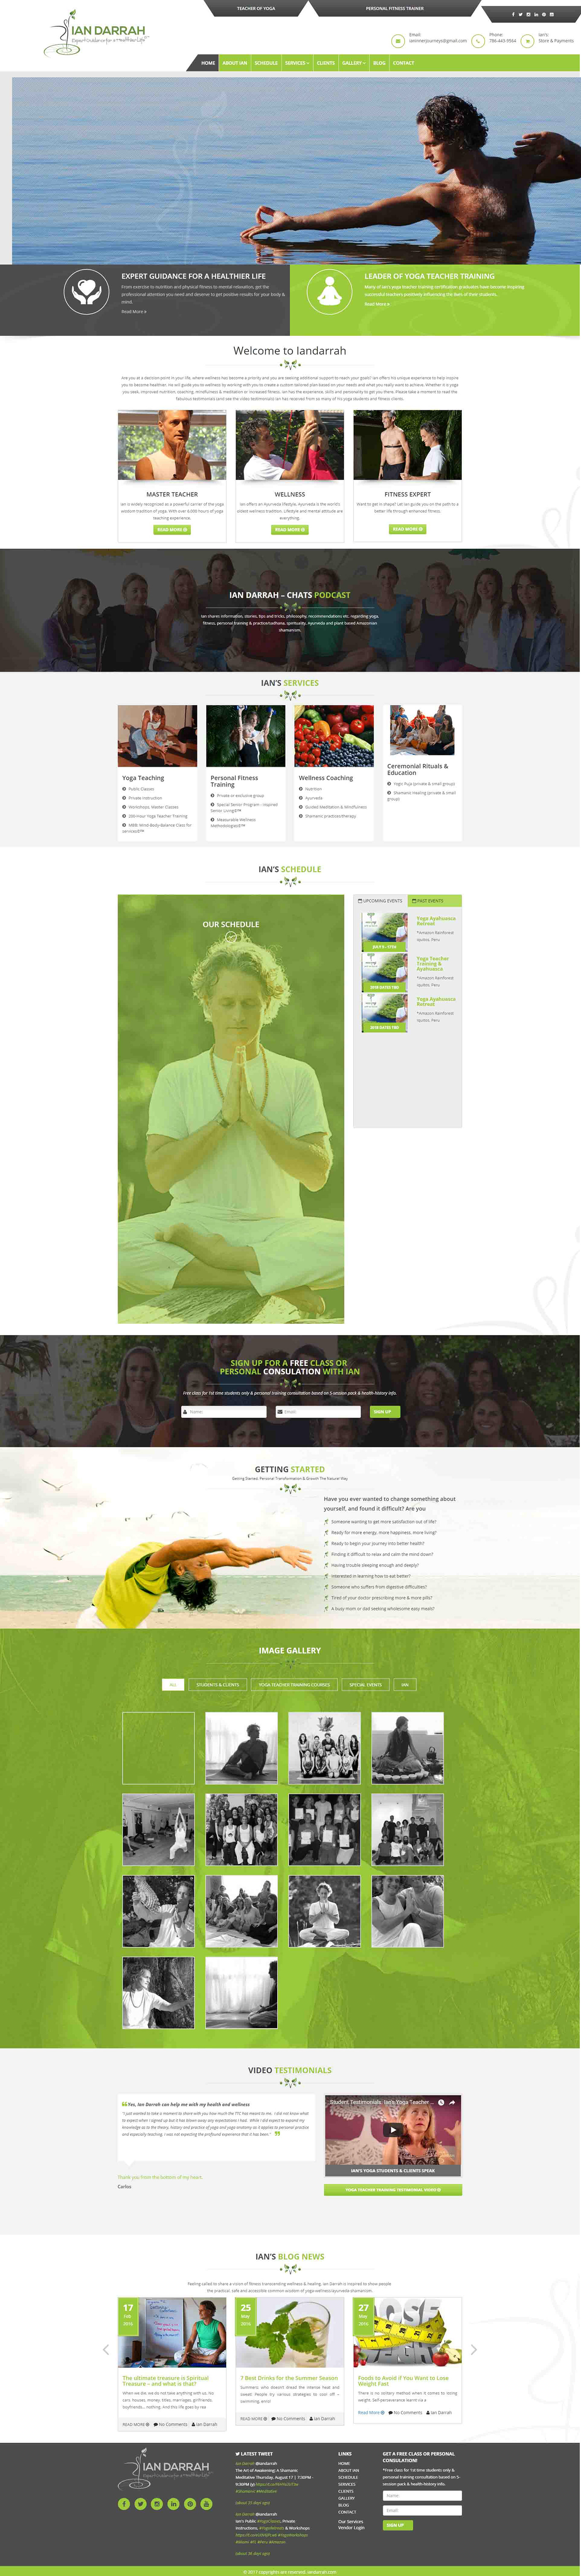 health template Yoga Template Yoga Leader trainer template Yoga Training Template landing page Fitness expert template Fitness website design ui design UX design